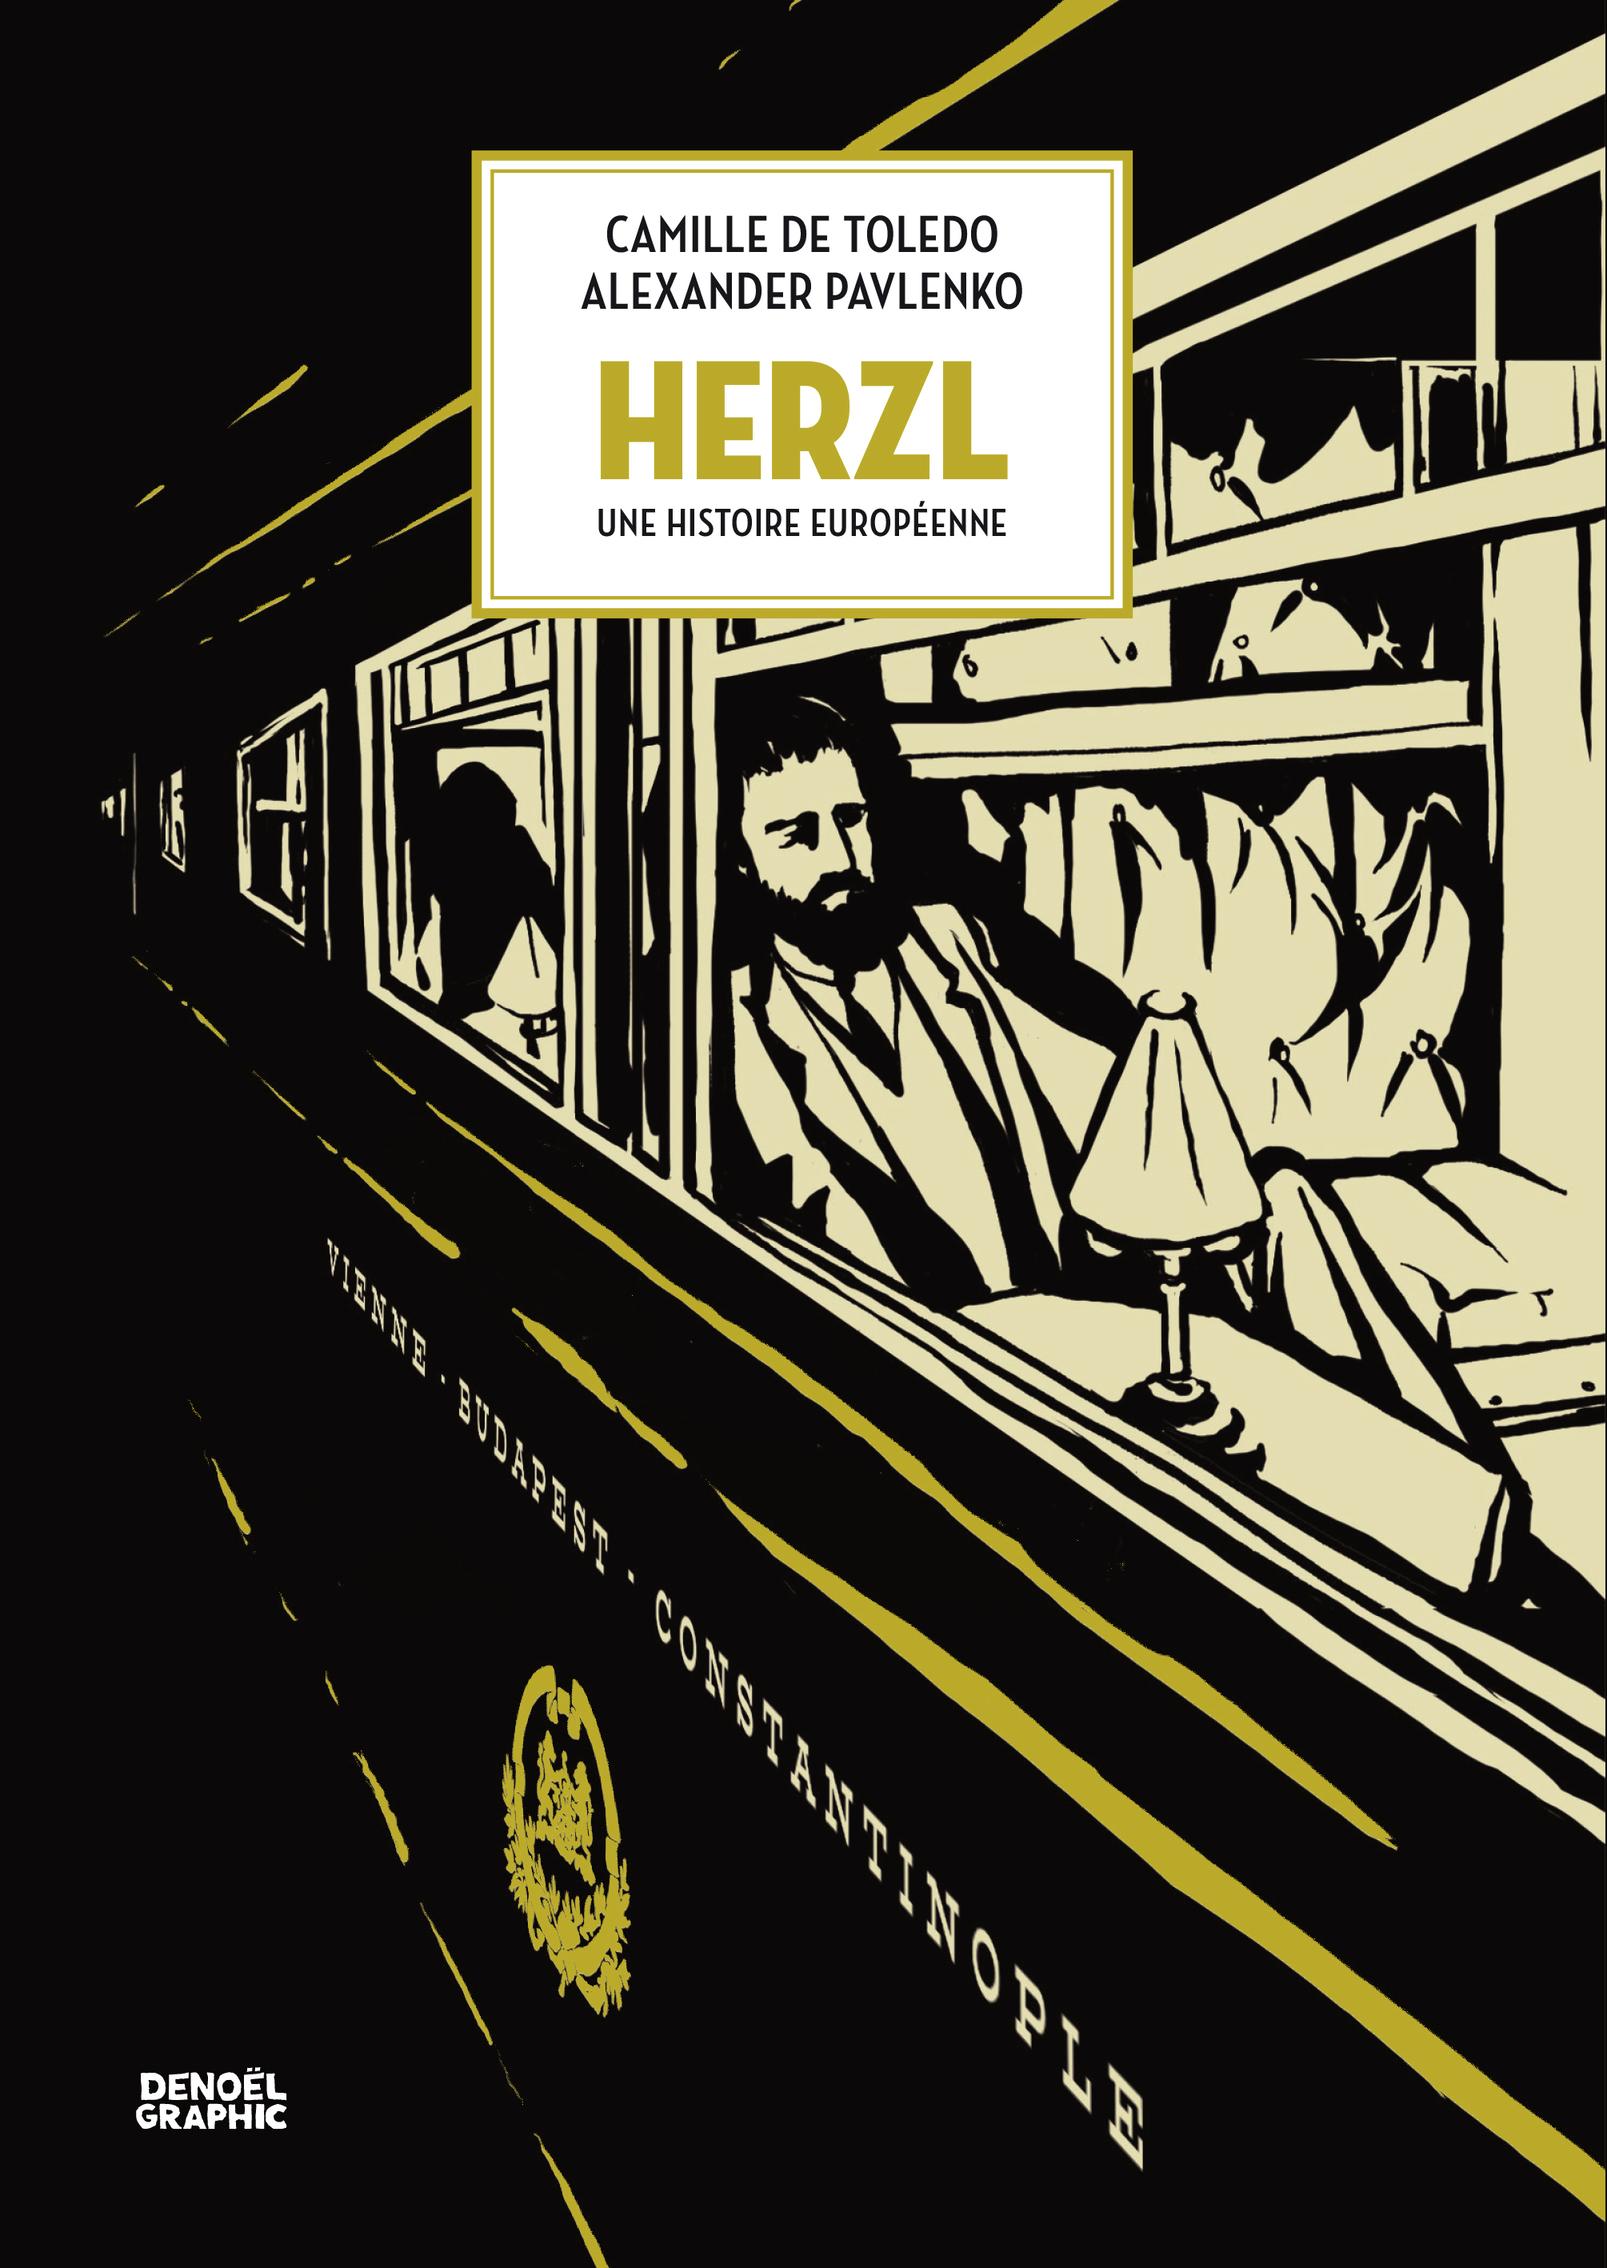 HERZL - UNE HISTOIRE EUROPEENNE